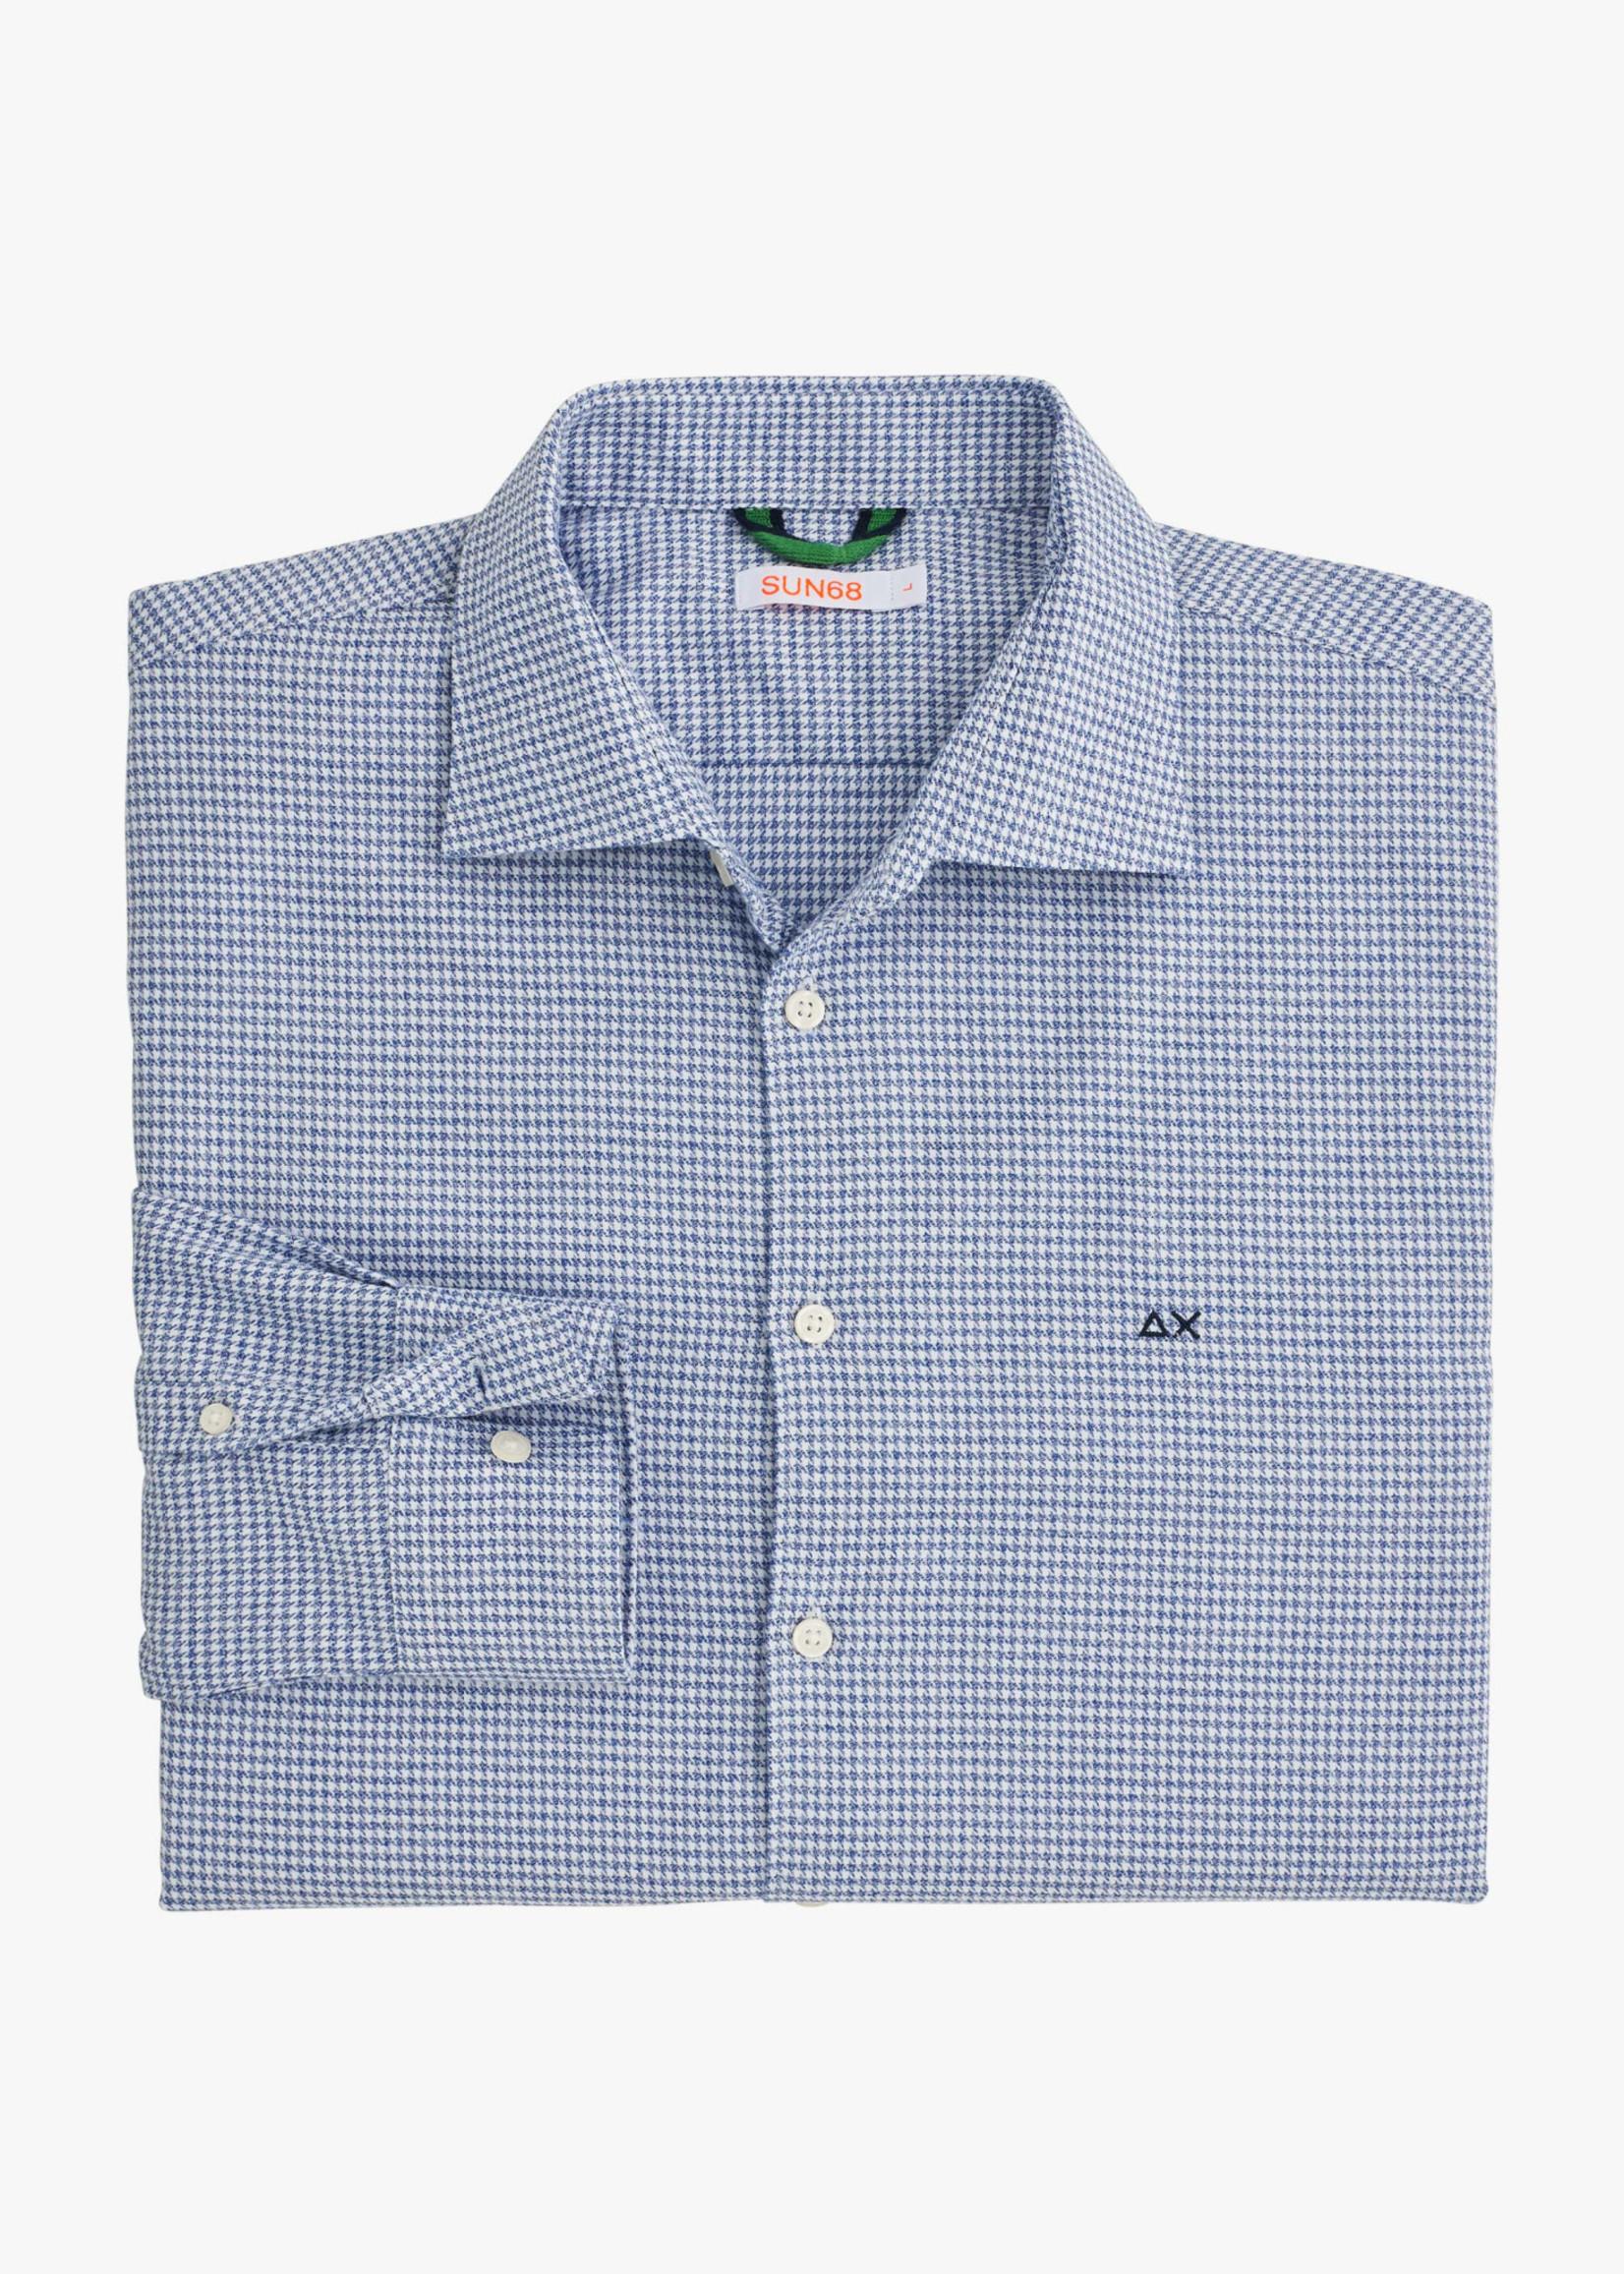 SUN68 Shirt Details French Collar L/S | Bleu Clair | SUN68